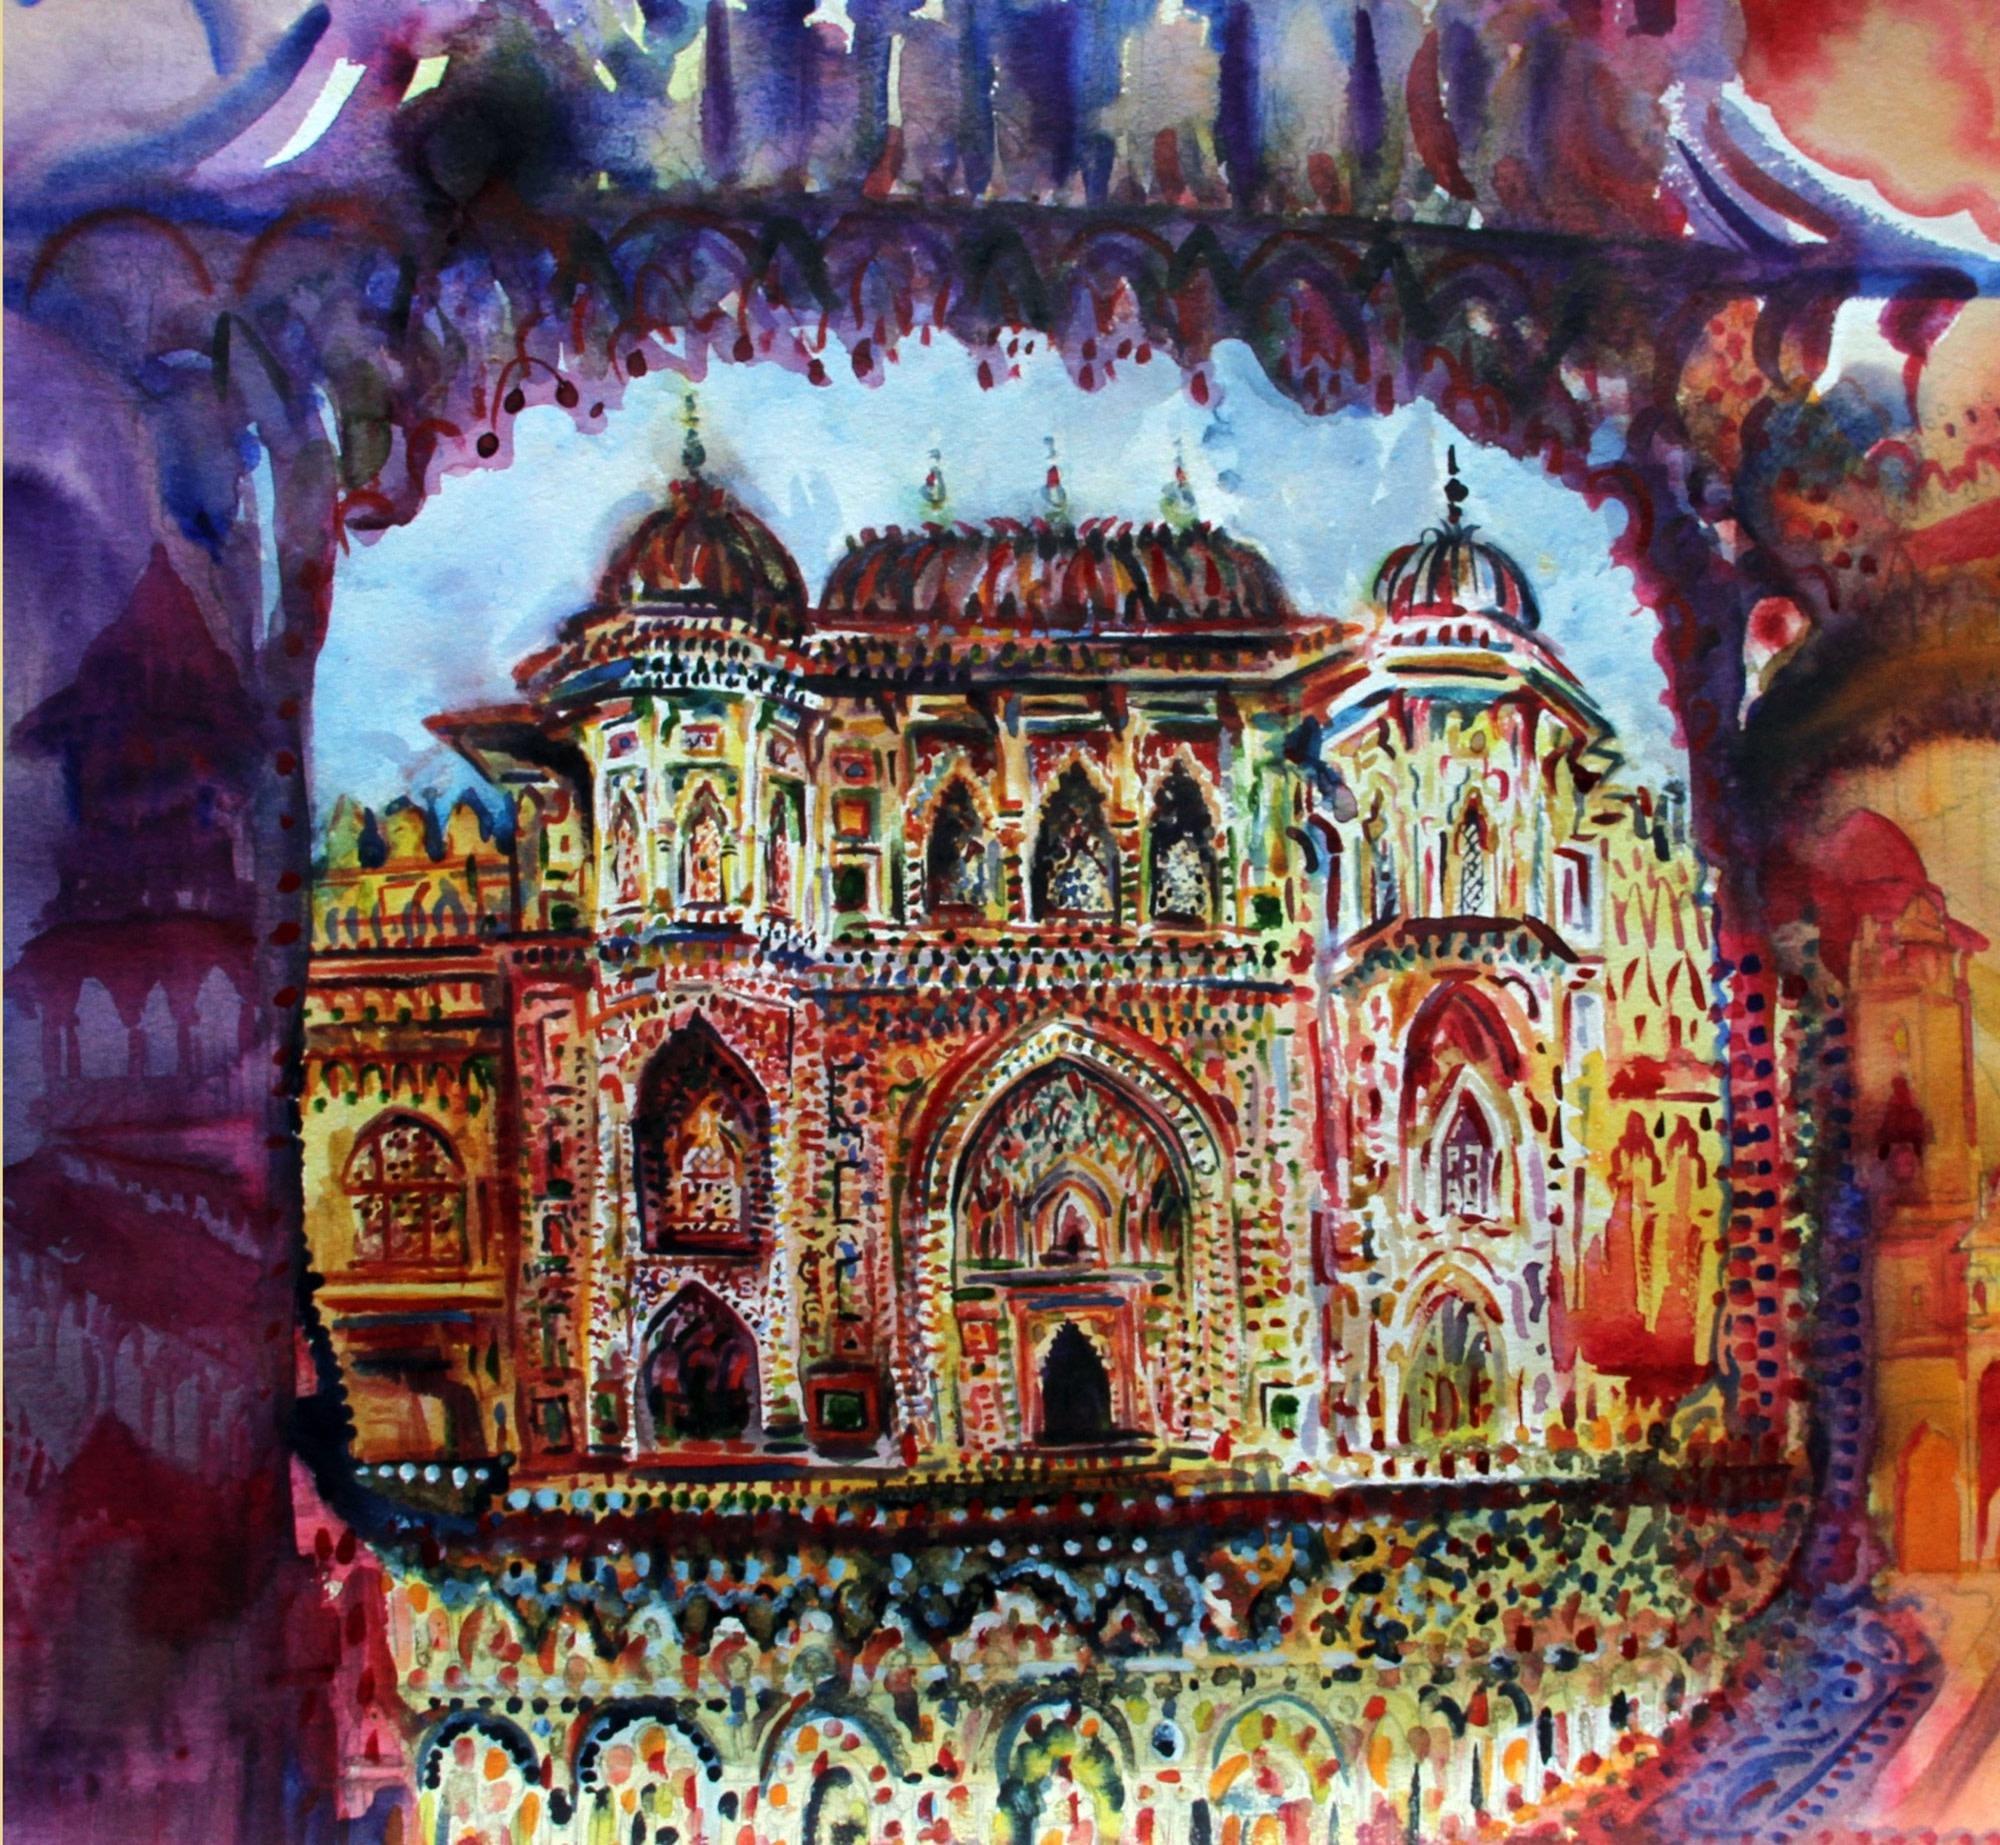 "<span class=""link fancybox-details-link""><a href=""/artists/94-neil-pittaway/works/12288-neil-pittaway-ganesh-pol-gateway-amber-fort-jaipur-india/"">View Detail Page</a></span><div class=""artist""><span class=""artist""><strong>Neil Pittaway</strong></span></div><div class=""title""><em>Ganesh Pol Gateway, Amber Fort, Jaipur, India</em></div><div class=""medium"">watercolour</div><div class=""dimensions"">Frame: 75 x 74 cm<br /> Artwork: 57 x 55 cm</div><div class=""price"">£850.00</div>"